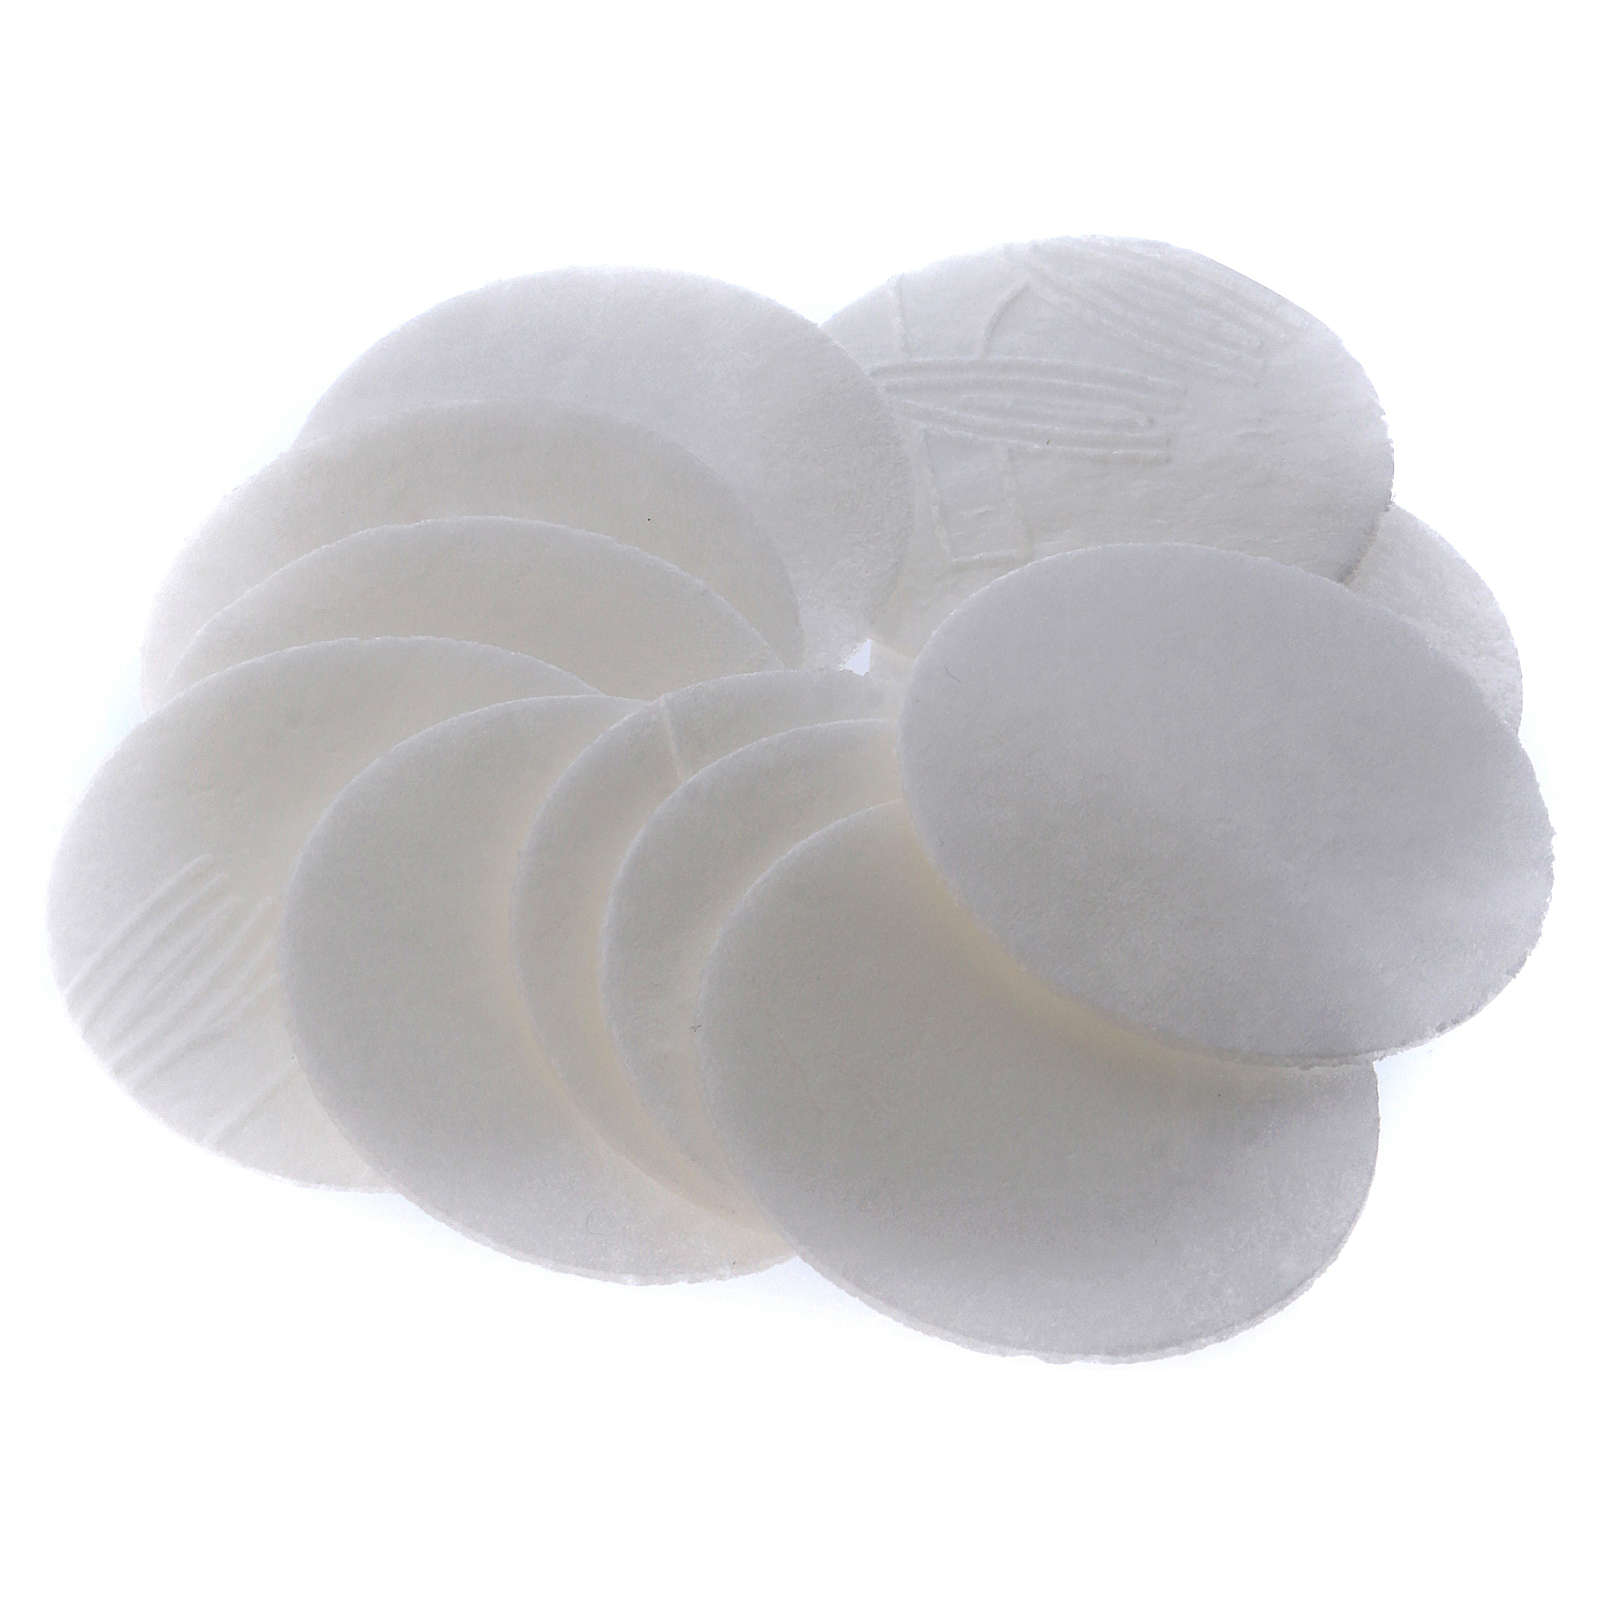 Formas / Hostias para celiacos bajo contenido gluten 50 unidades diám. 3,5 cm. 3